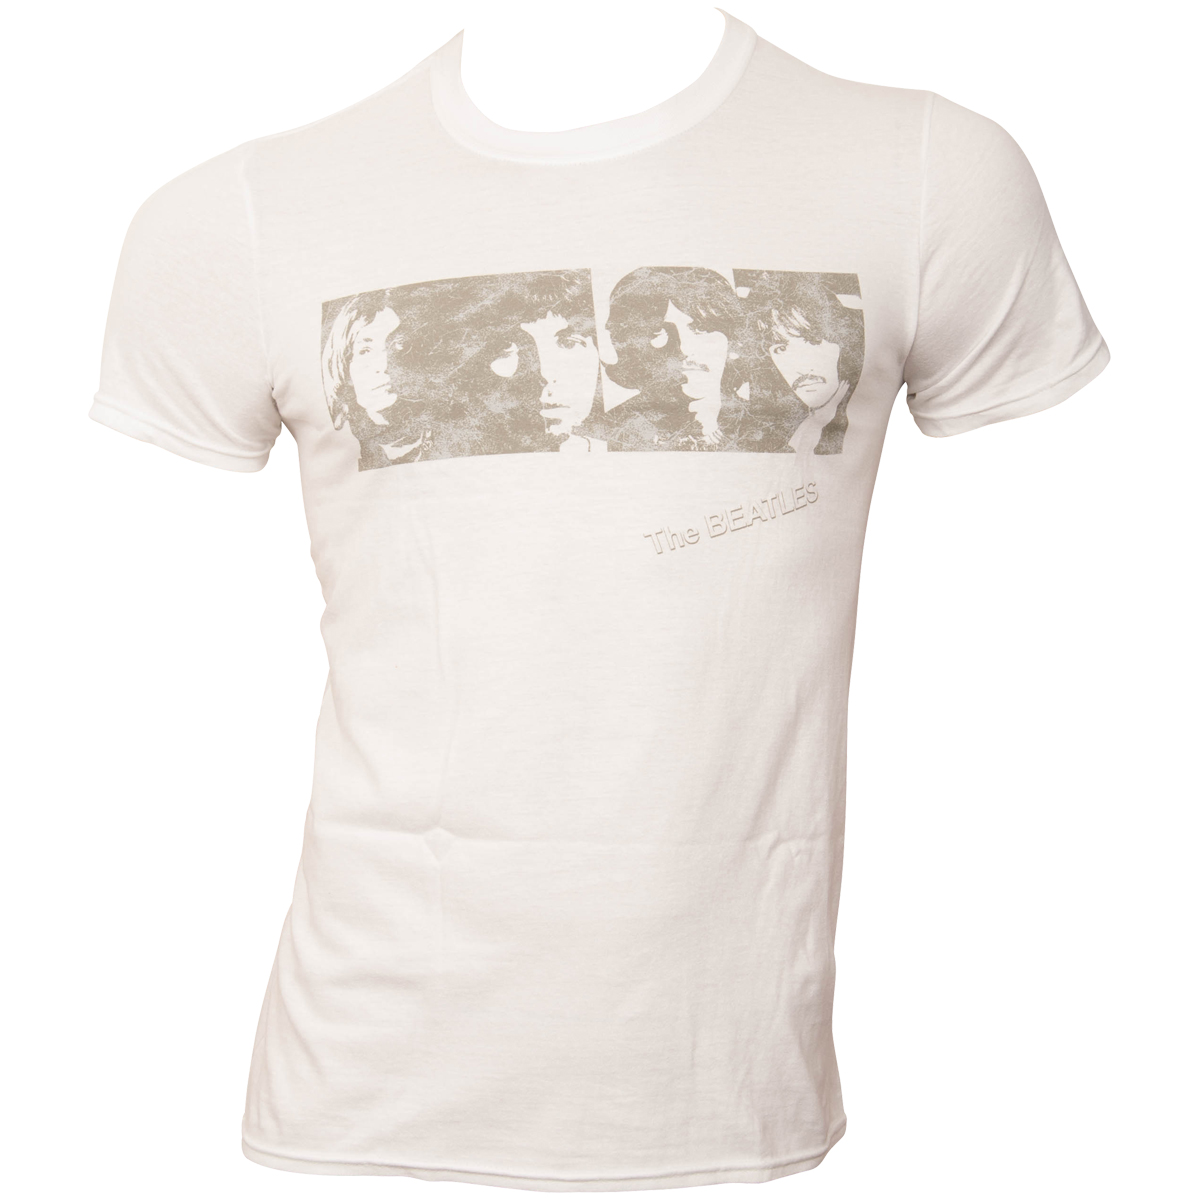 The Beatles - T-Shirt White Album Faces - weiß